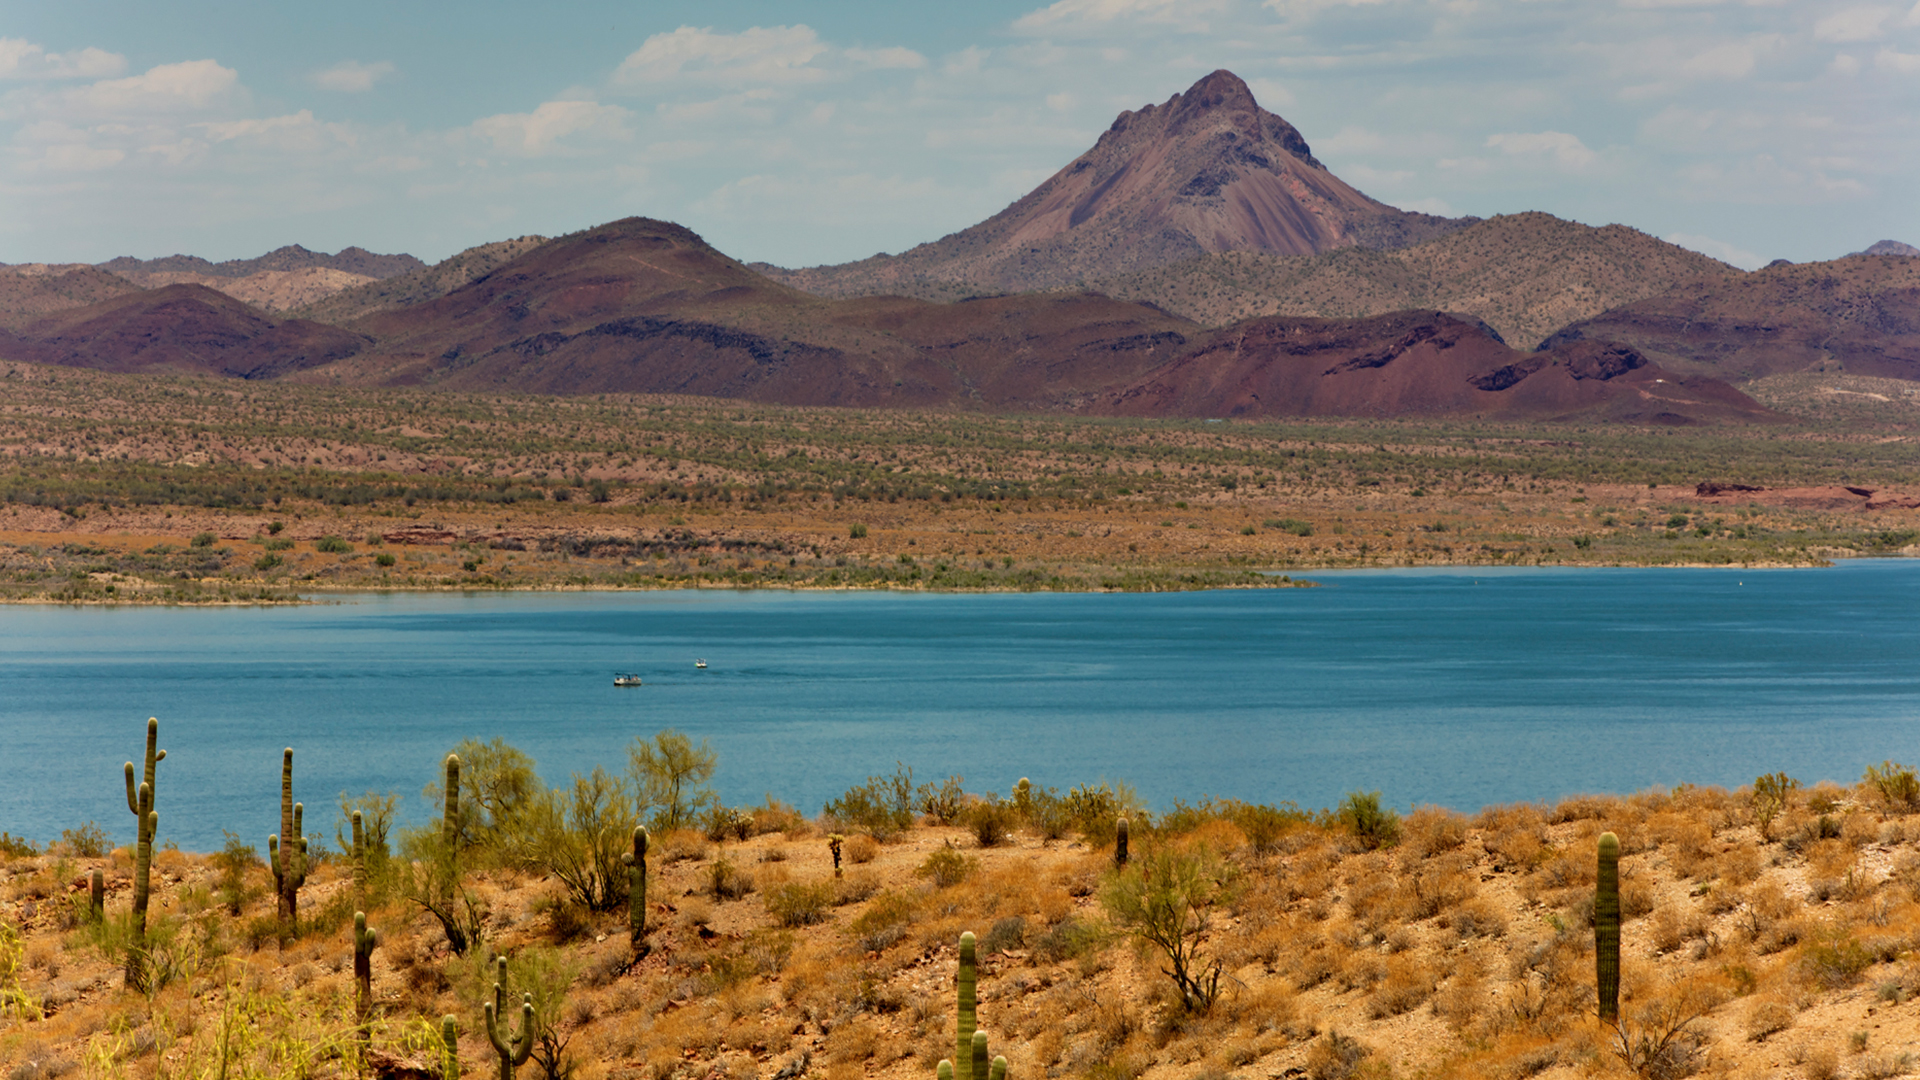 Escape the Heat: Visit Arizona this Summer